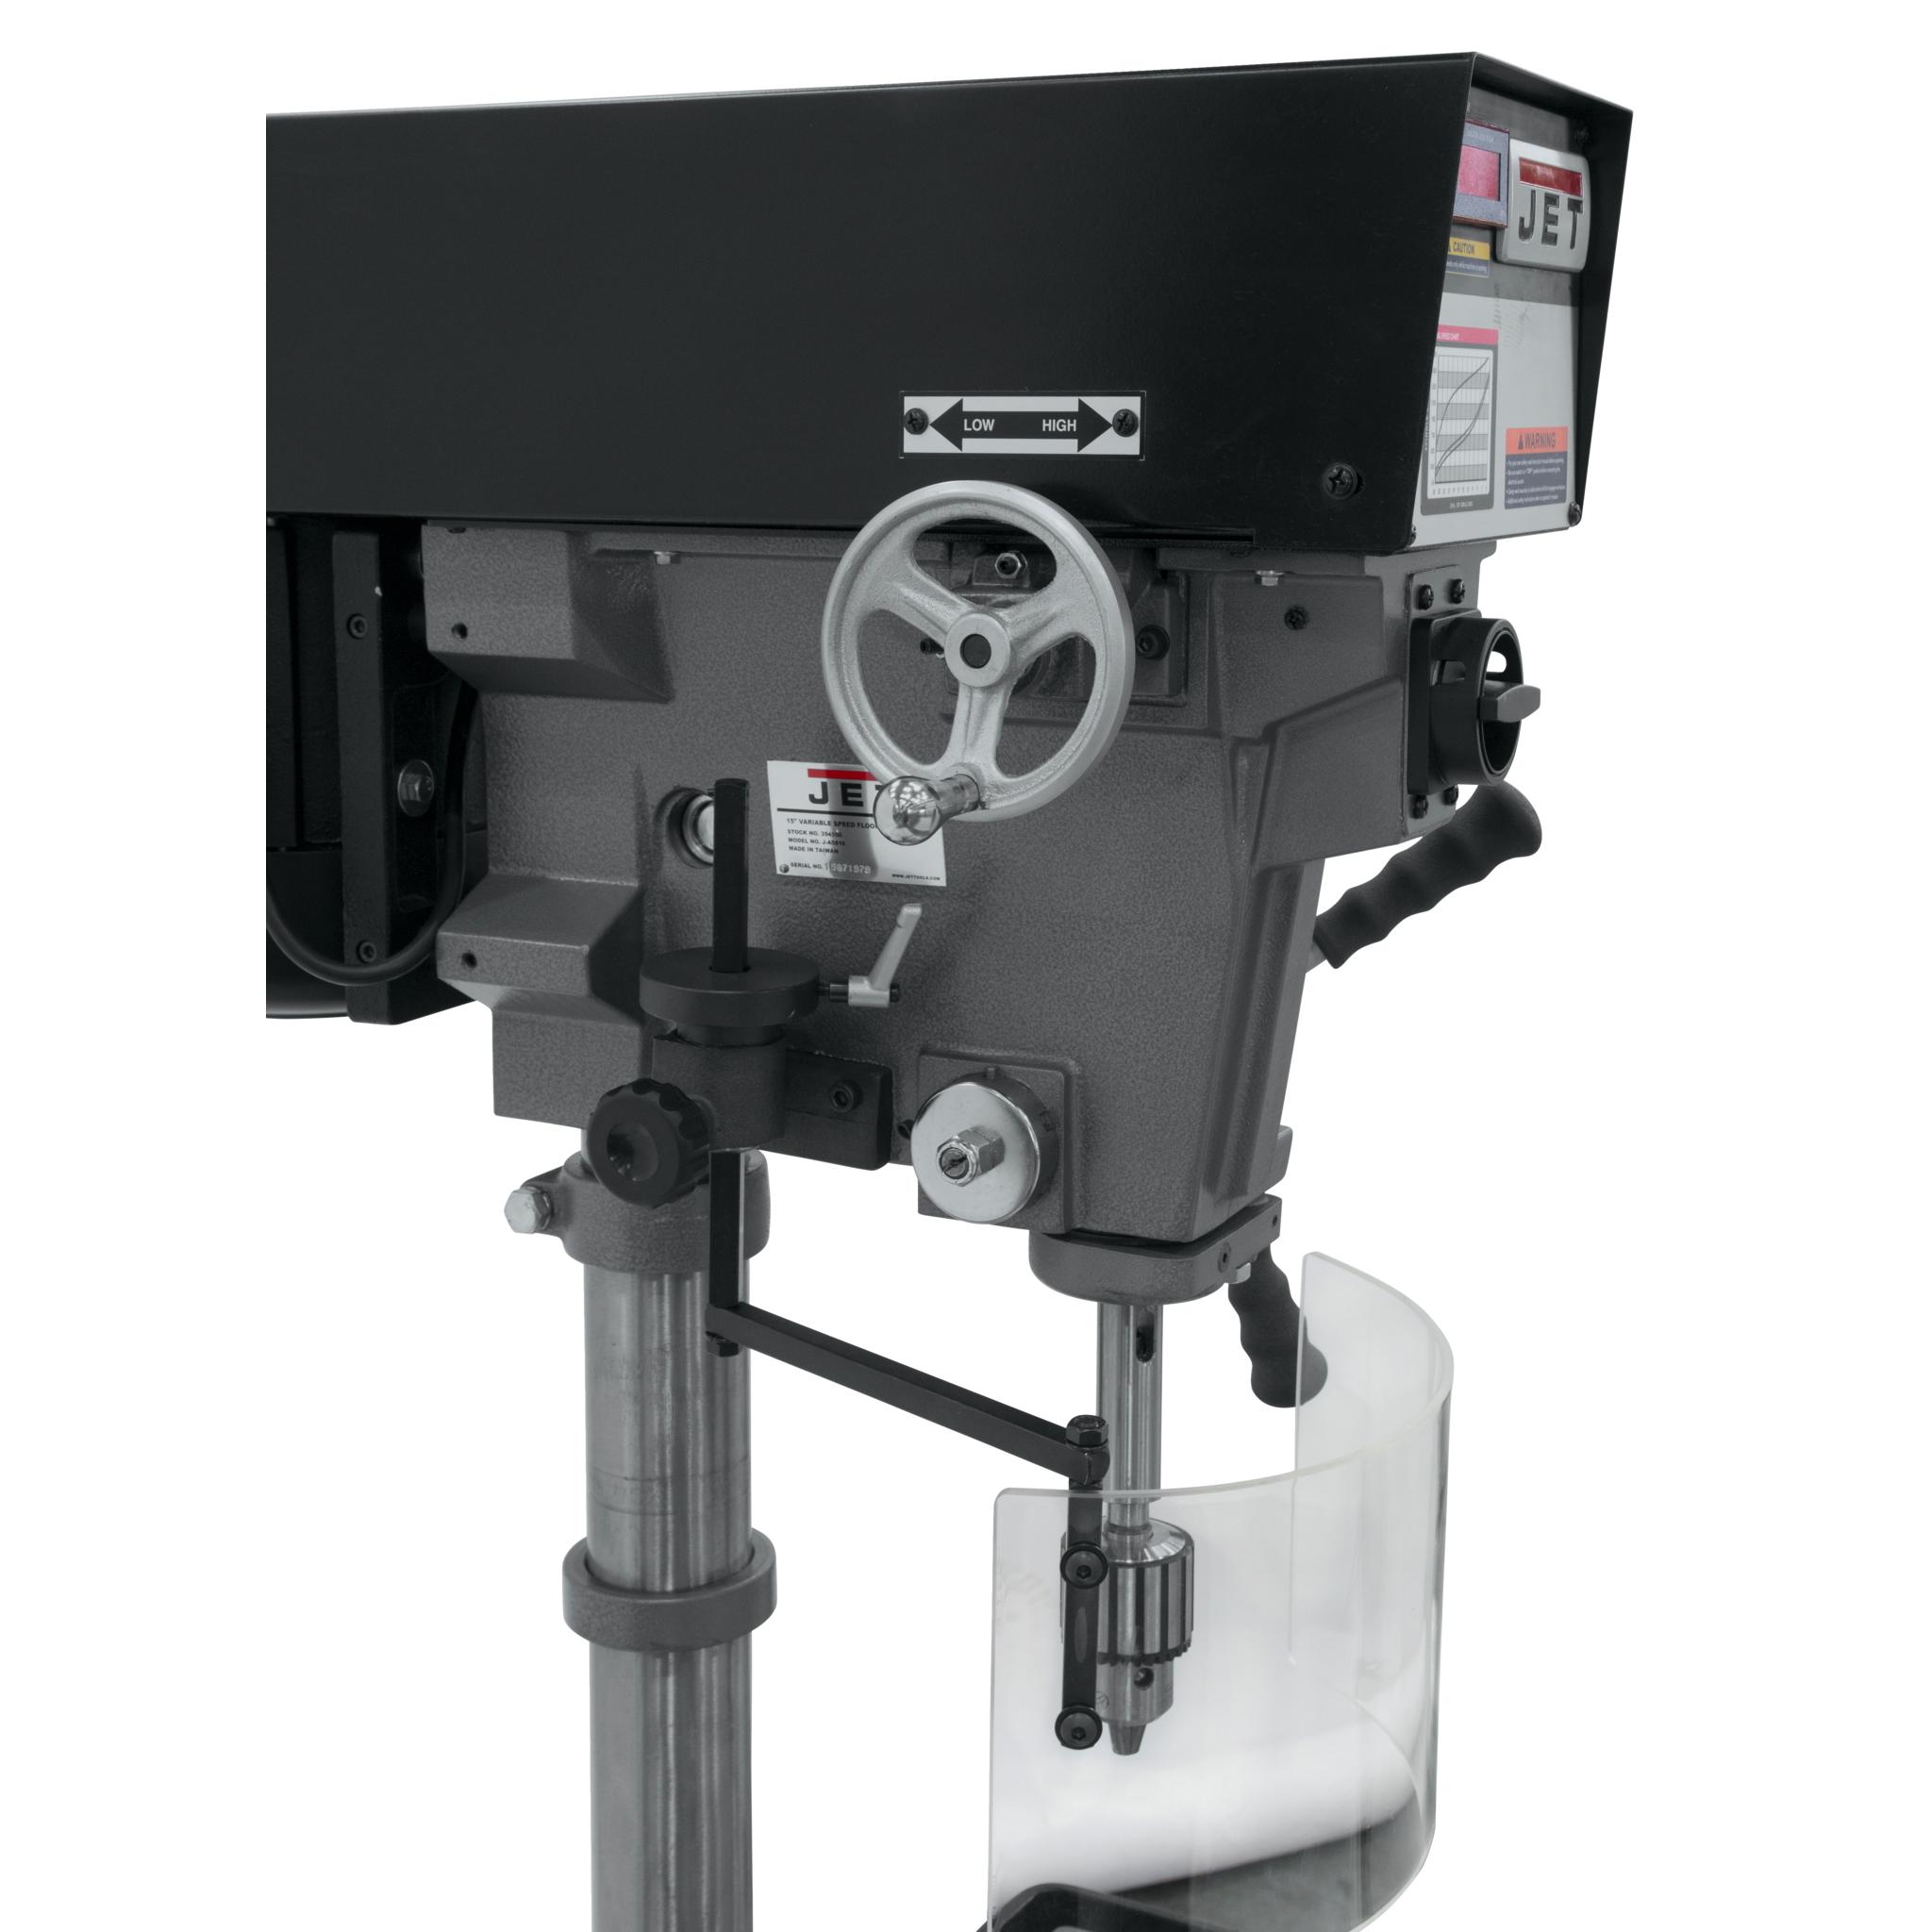 Jet J A5816 15 Quot Variable Speed Floor Model Drill Press